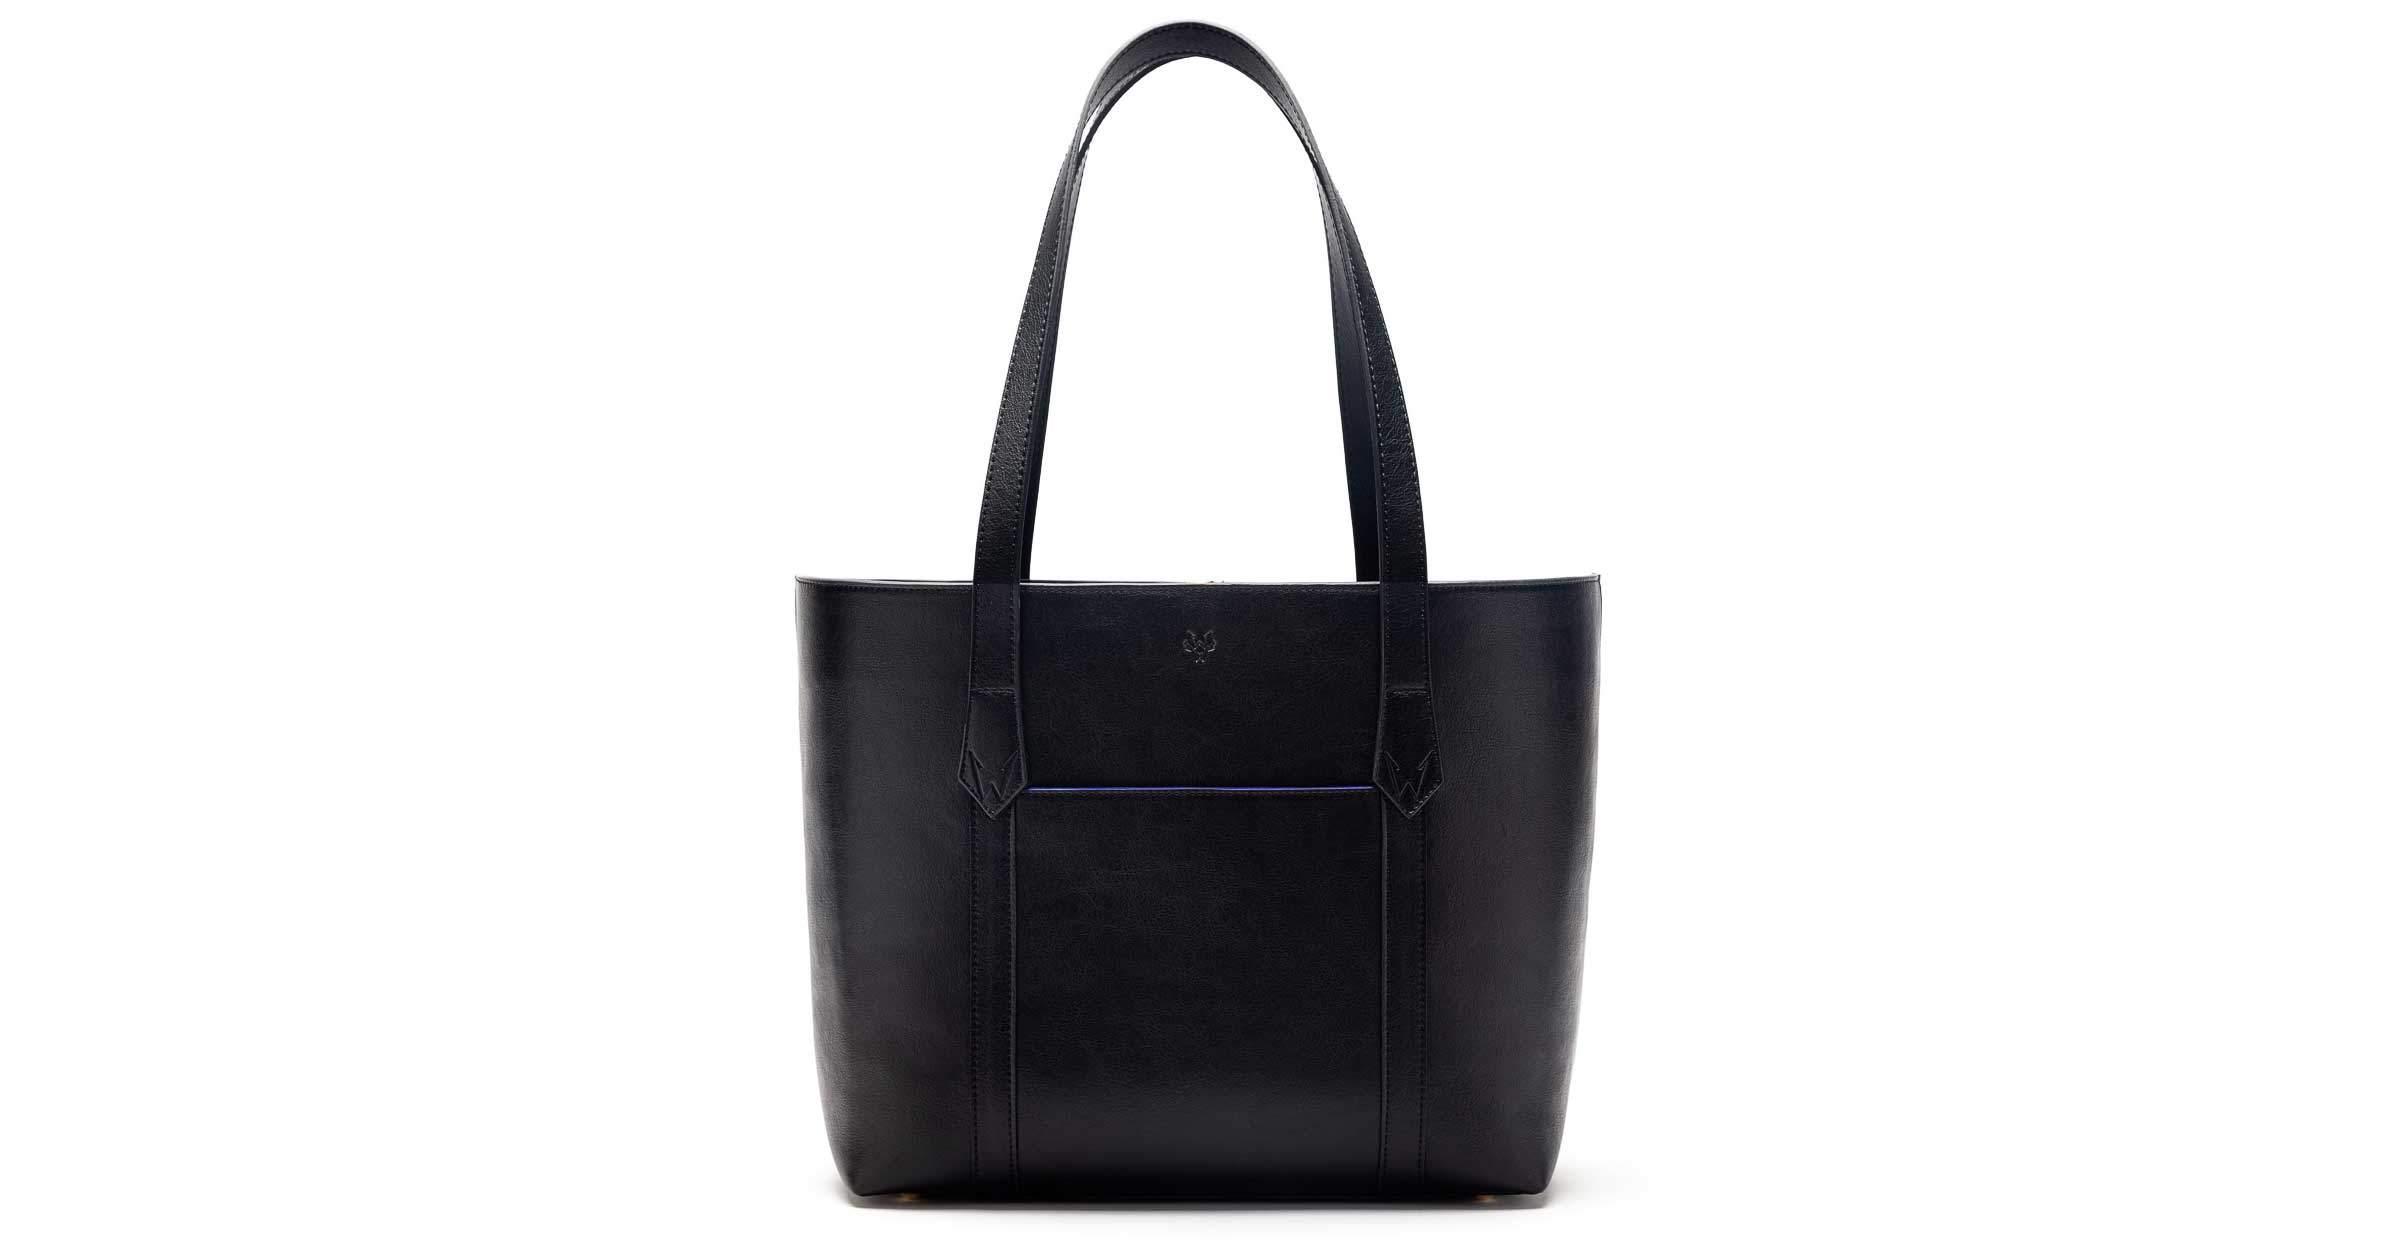 Maddox Vegan Tote Bag in Black | Watson & Wolfe